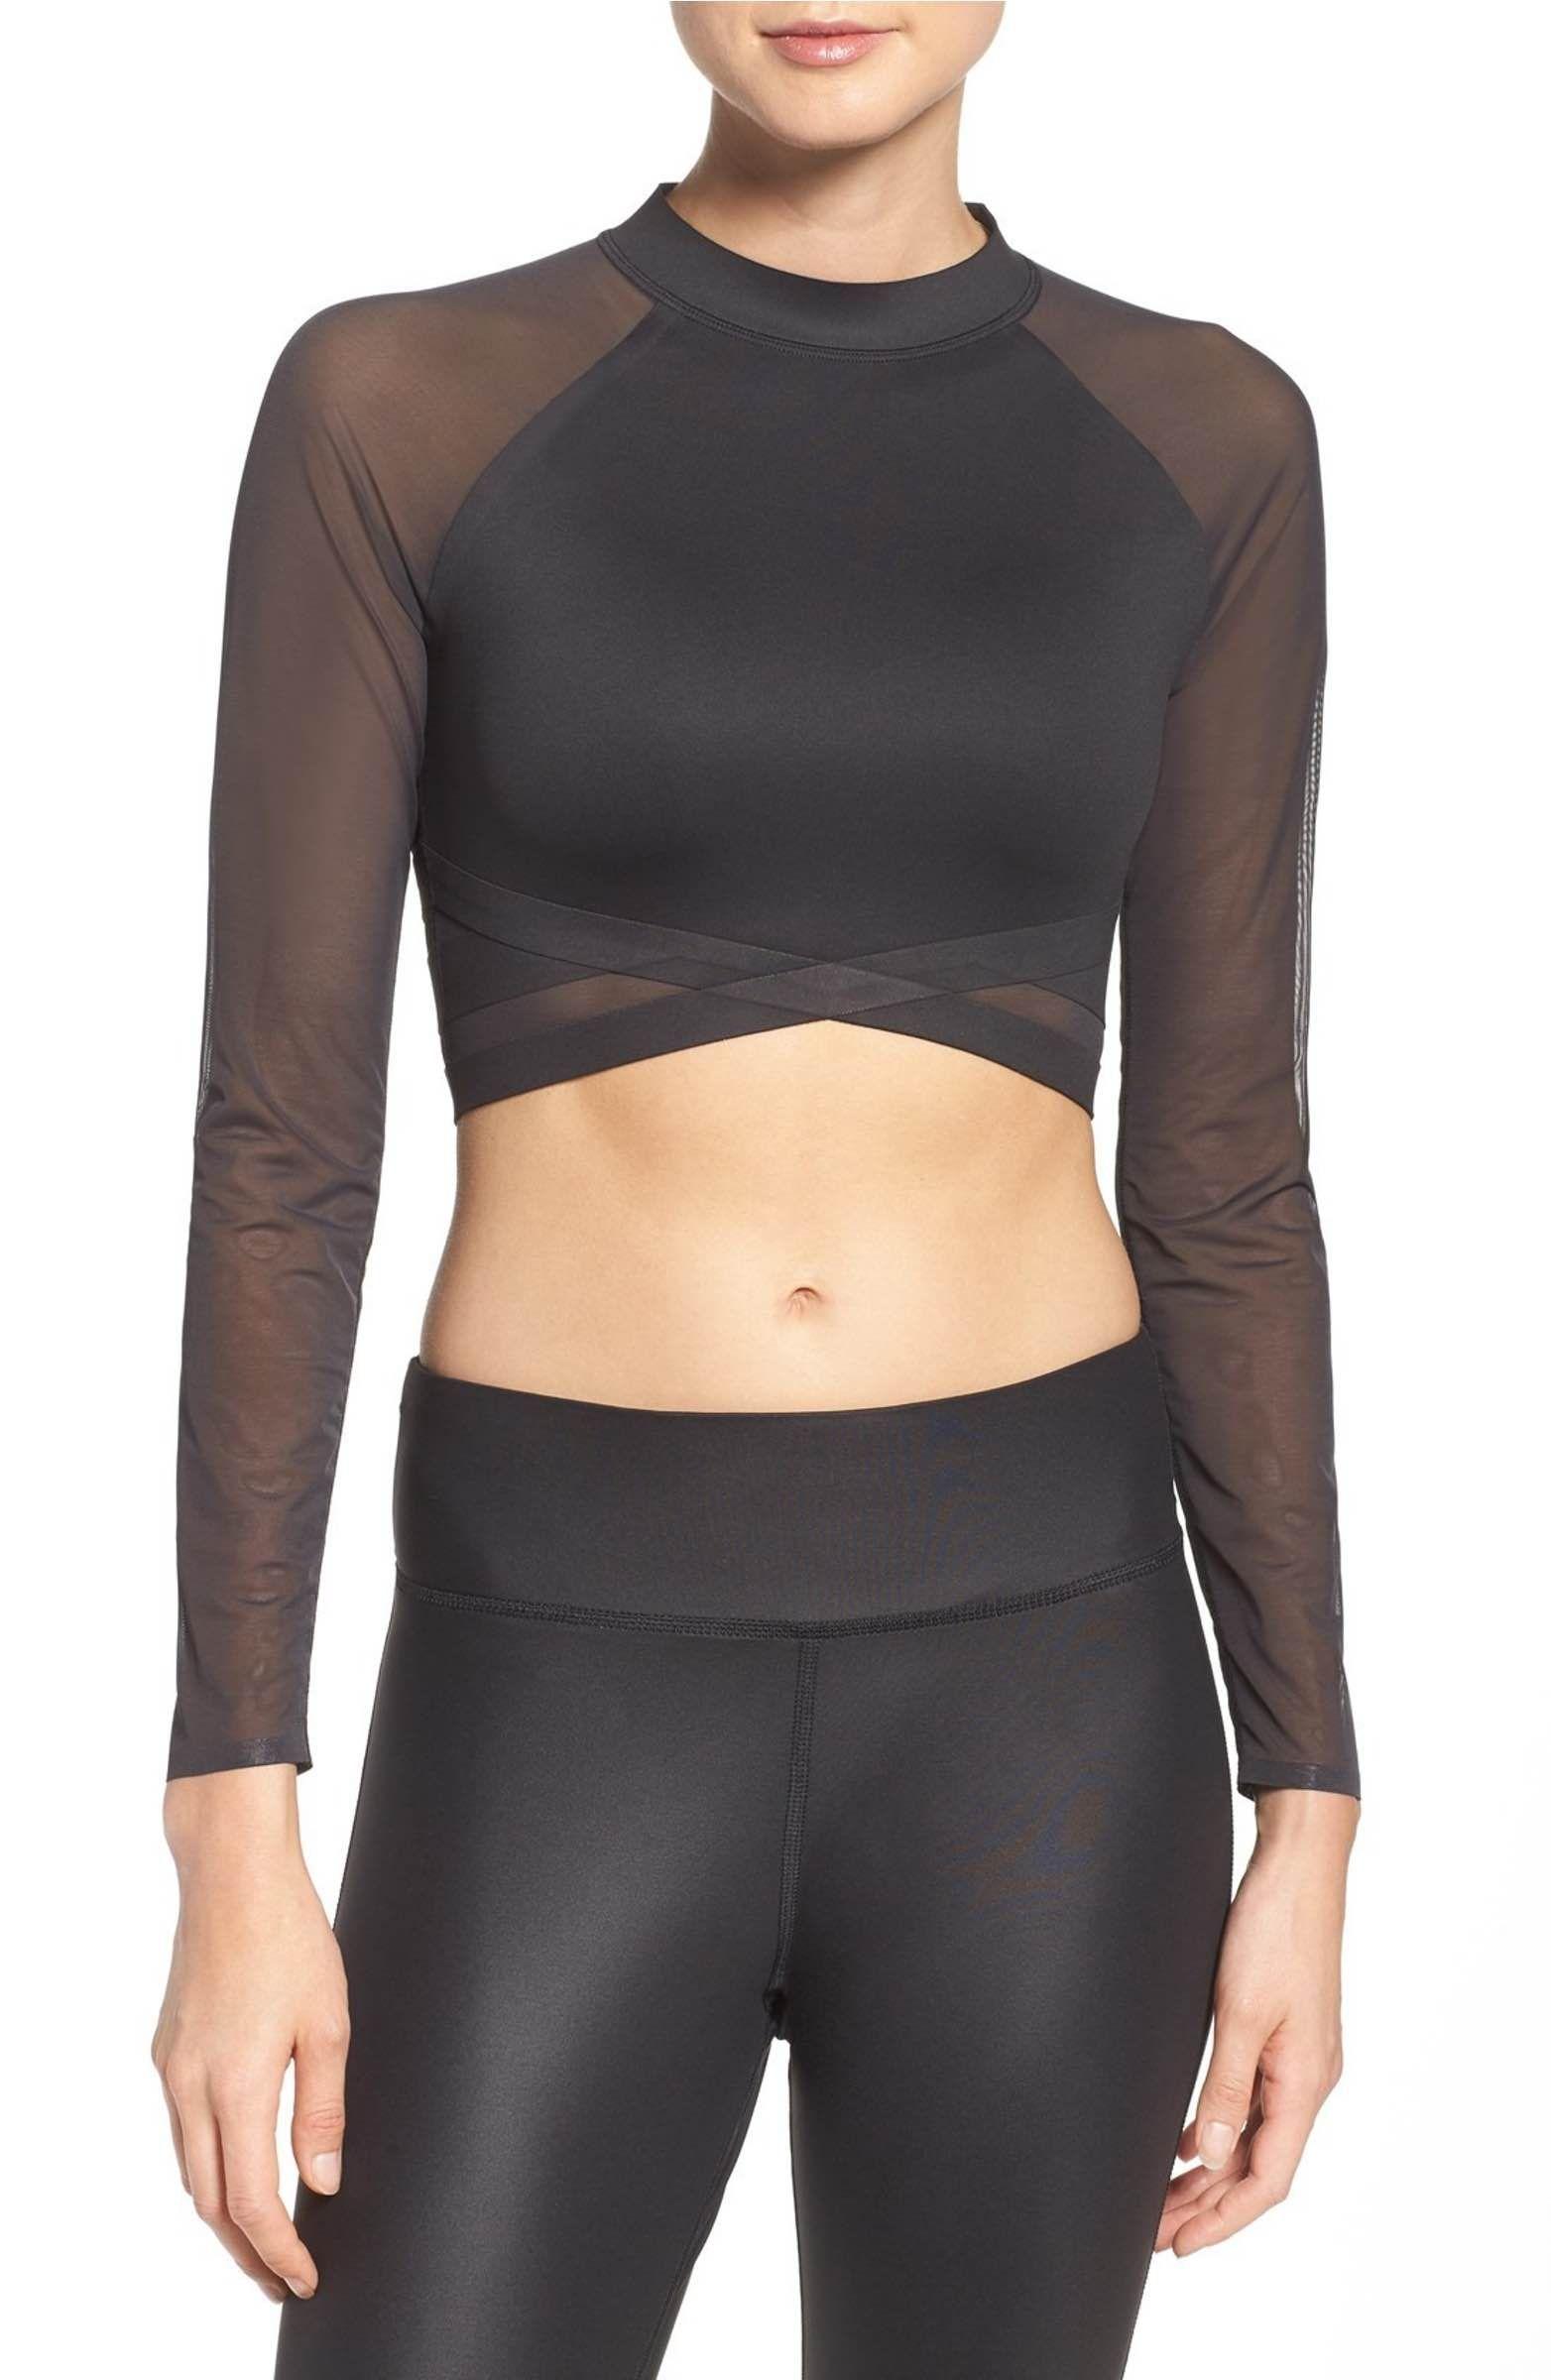 6b4ddbda Main Image - Reebok Cardio Crop Top | Clothes Wishlist | Womens ...